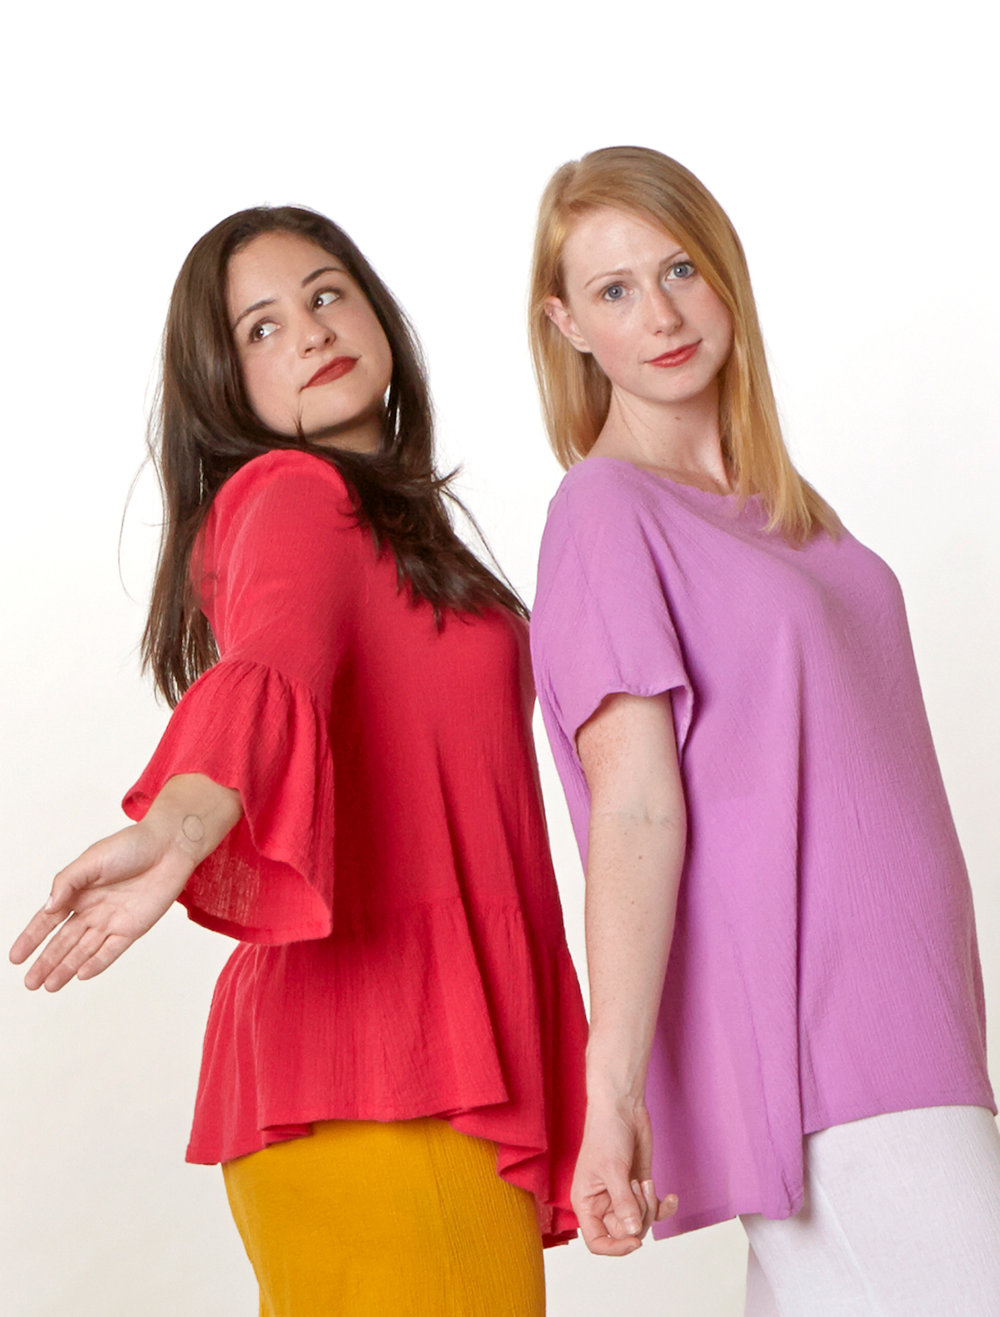 Franci Shirt in Valerian, Ivy Shirt in lxia Cotton Gauze